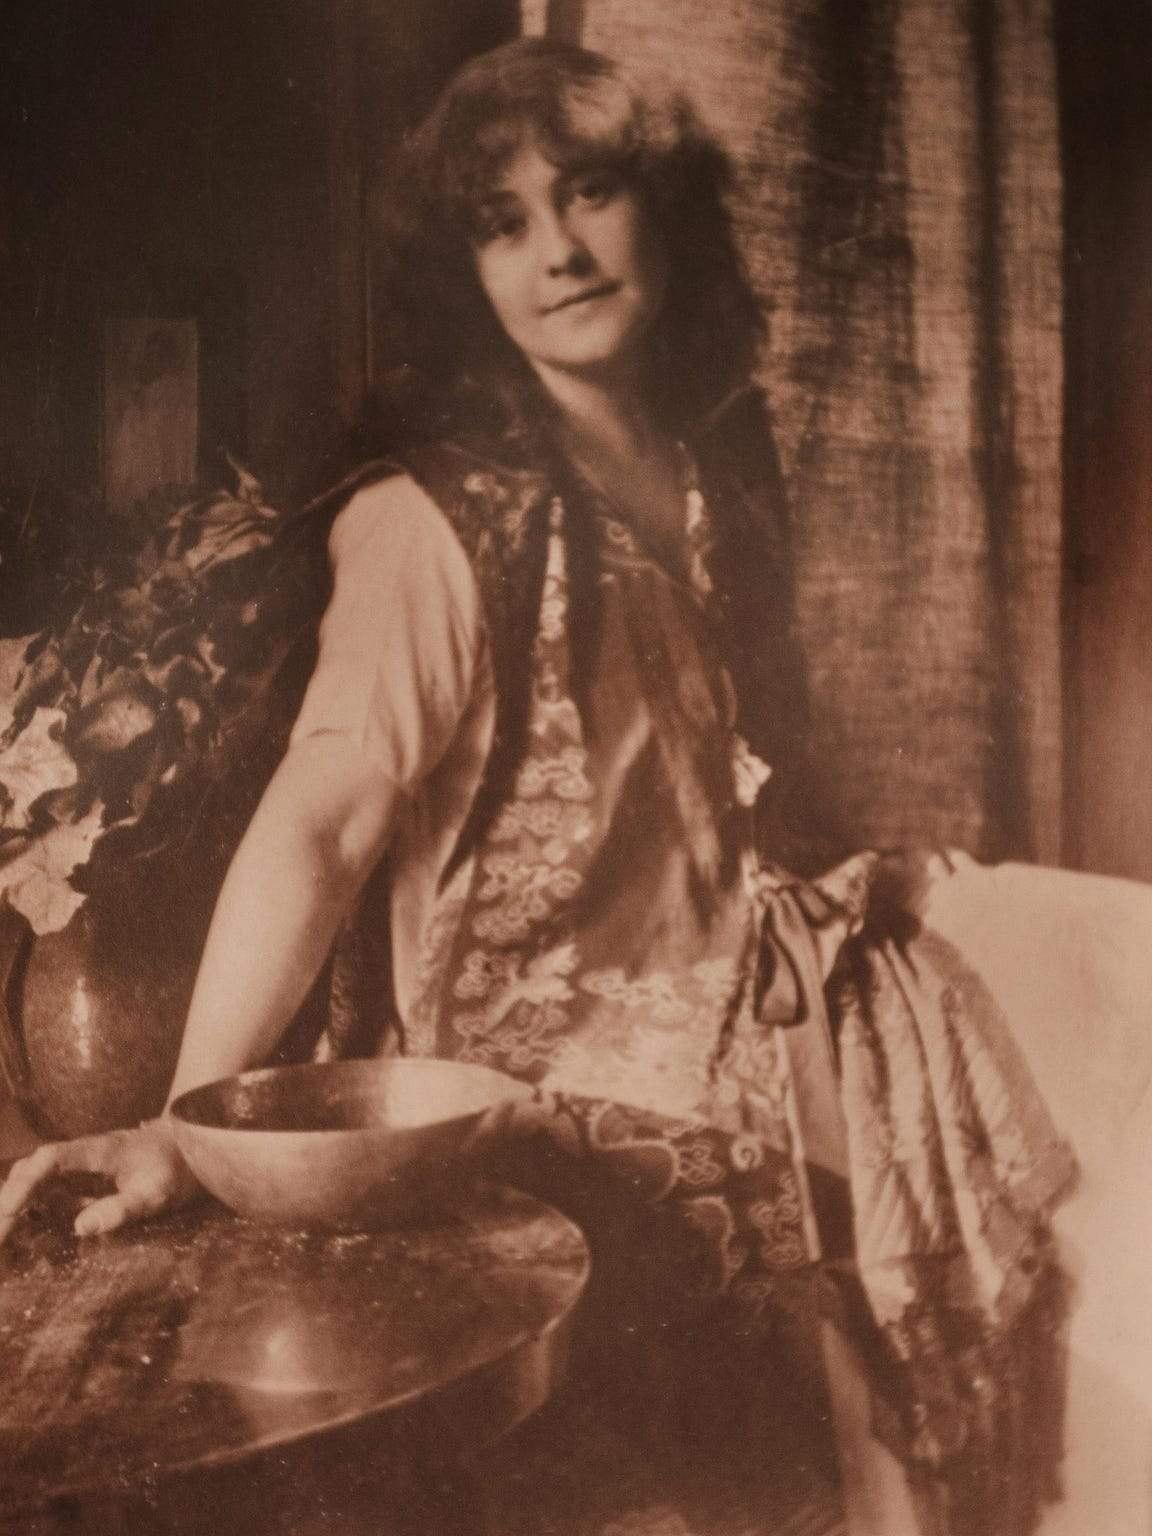 A photographic portrait of Rose O'Neill made around